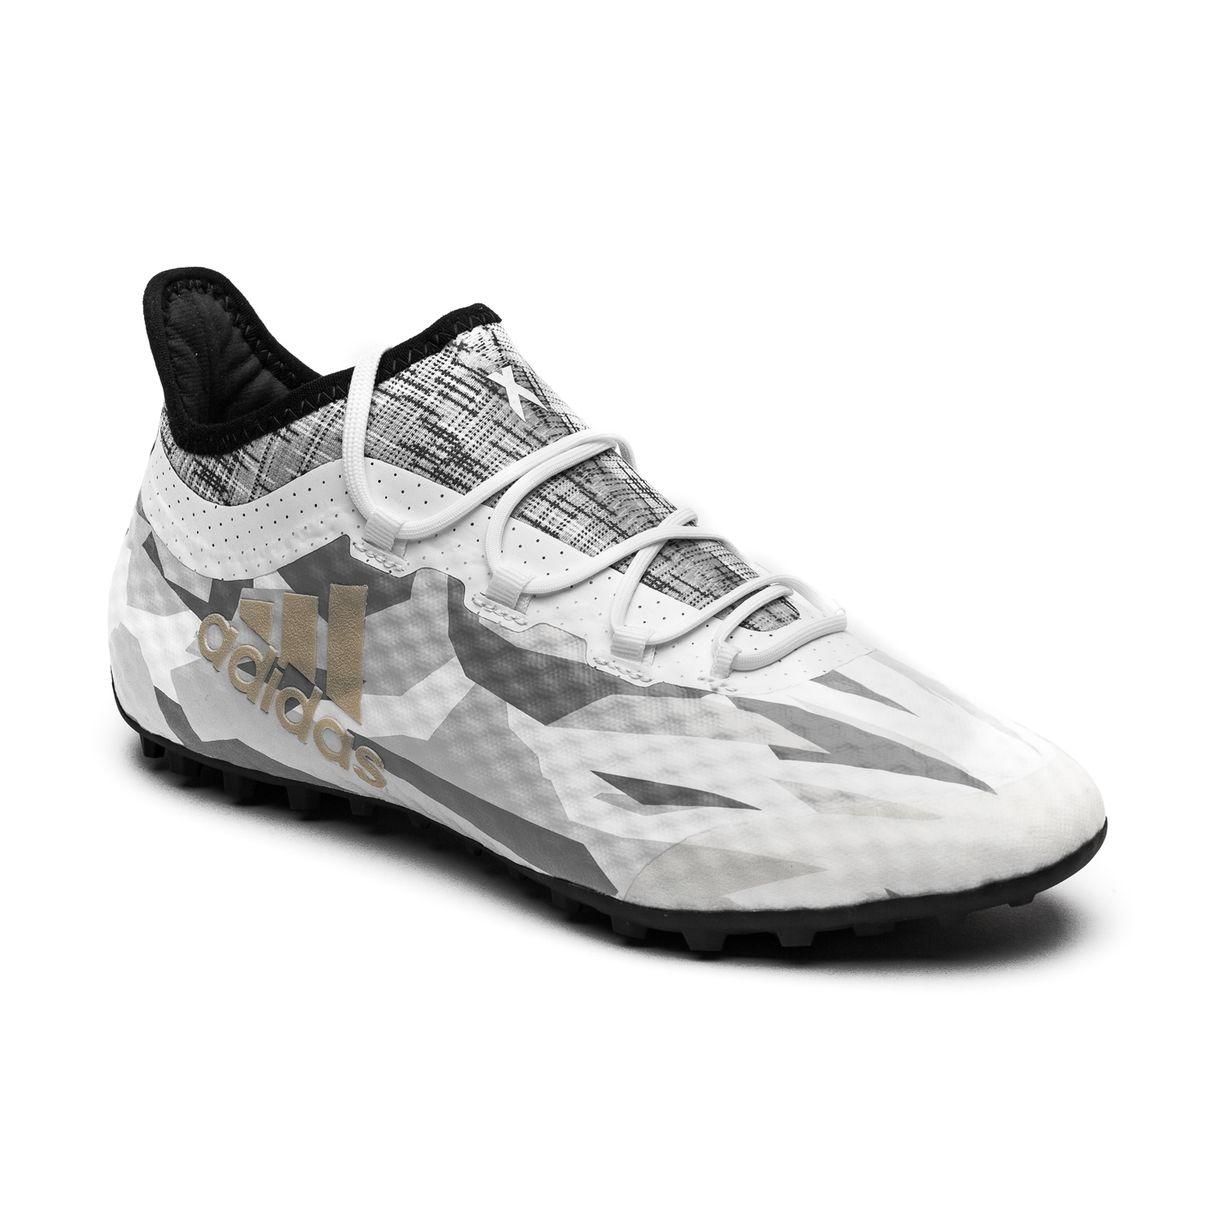 newest 99e64 6cbe0 ... Click to enlarge image  adidas x tango-16 1 tf camouflage white core black b.jpg ...